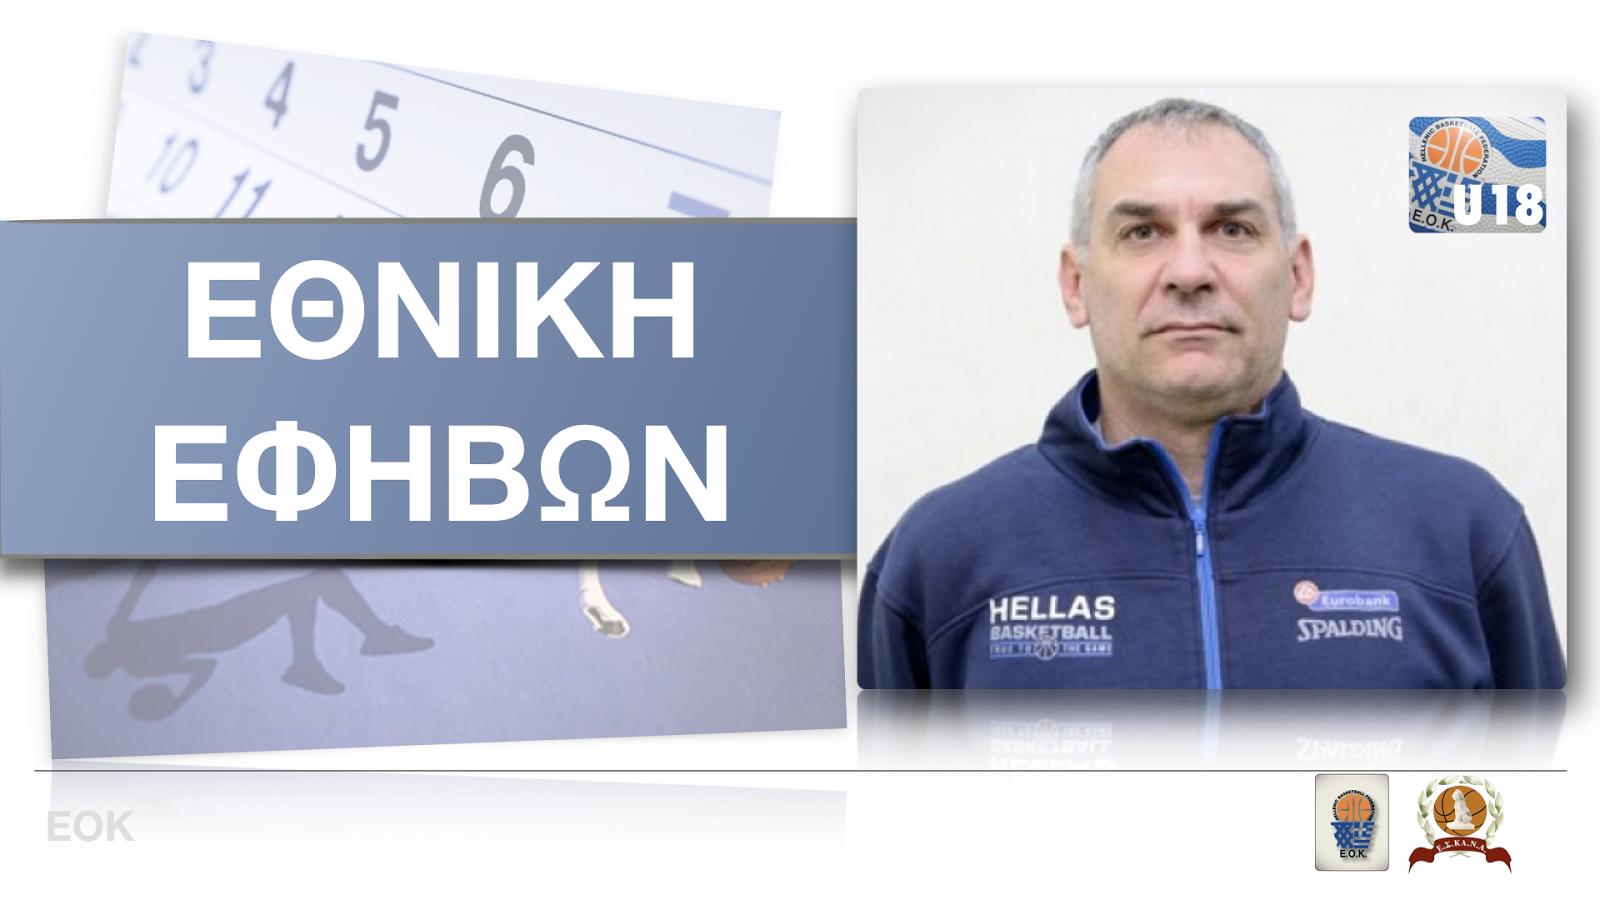 EOK | Εθνική Εφήβων, Γ. Βλασσόπουλος: «Βασικός στόχος να βγουν παιδιά που θα παίξουν μπάσκετ»